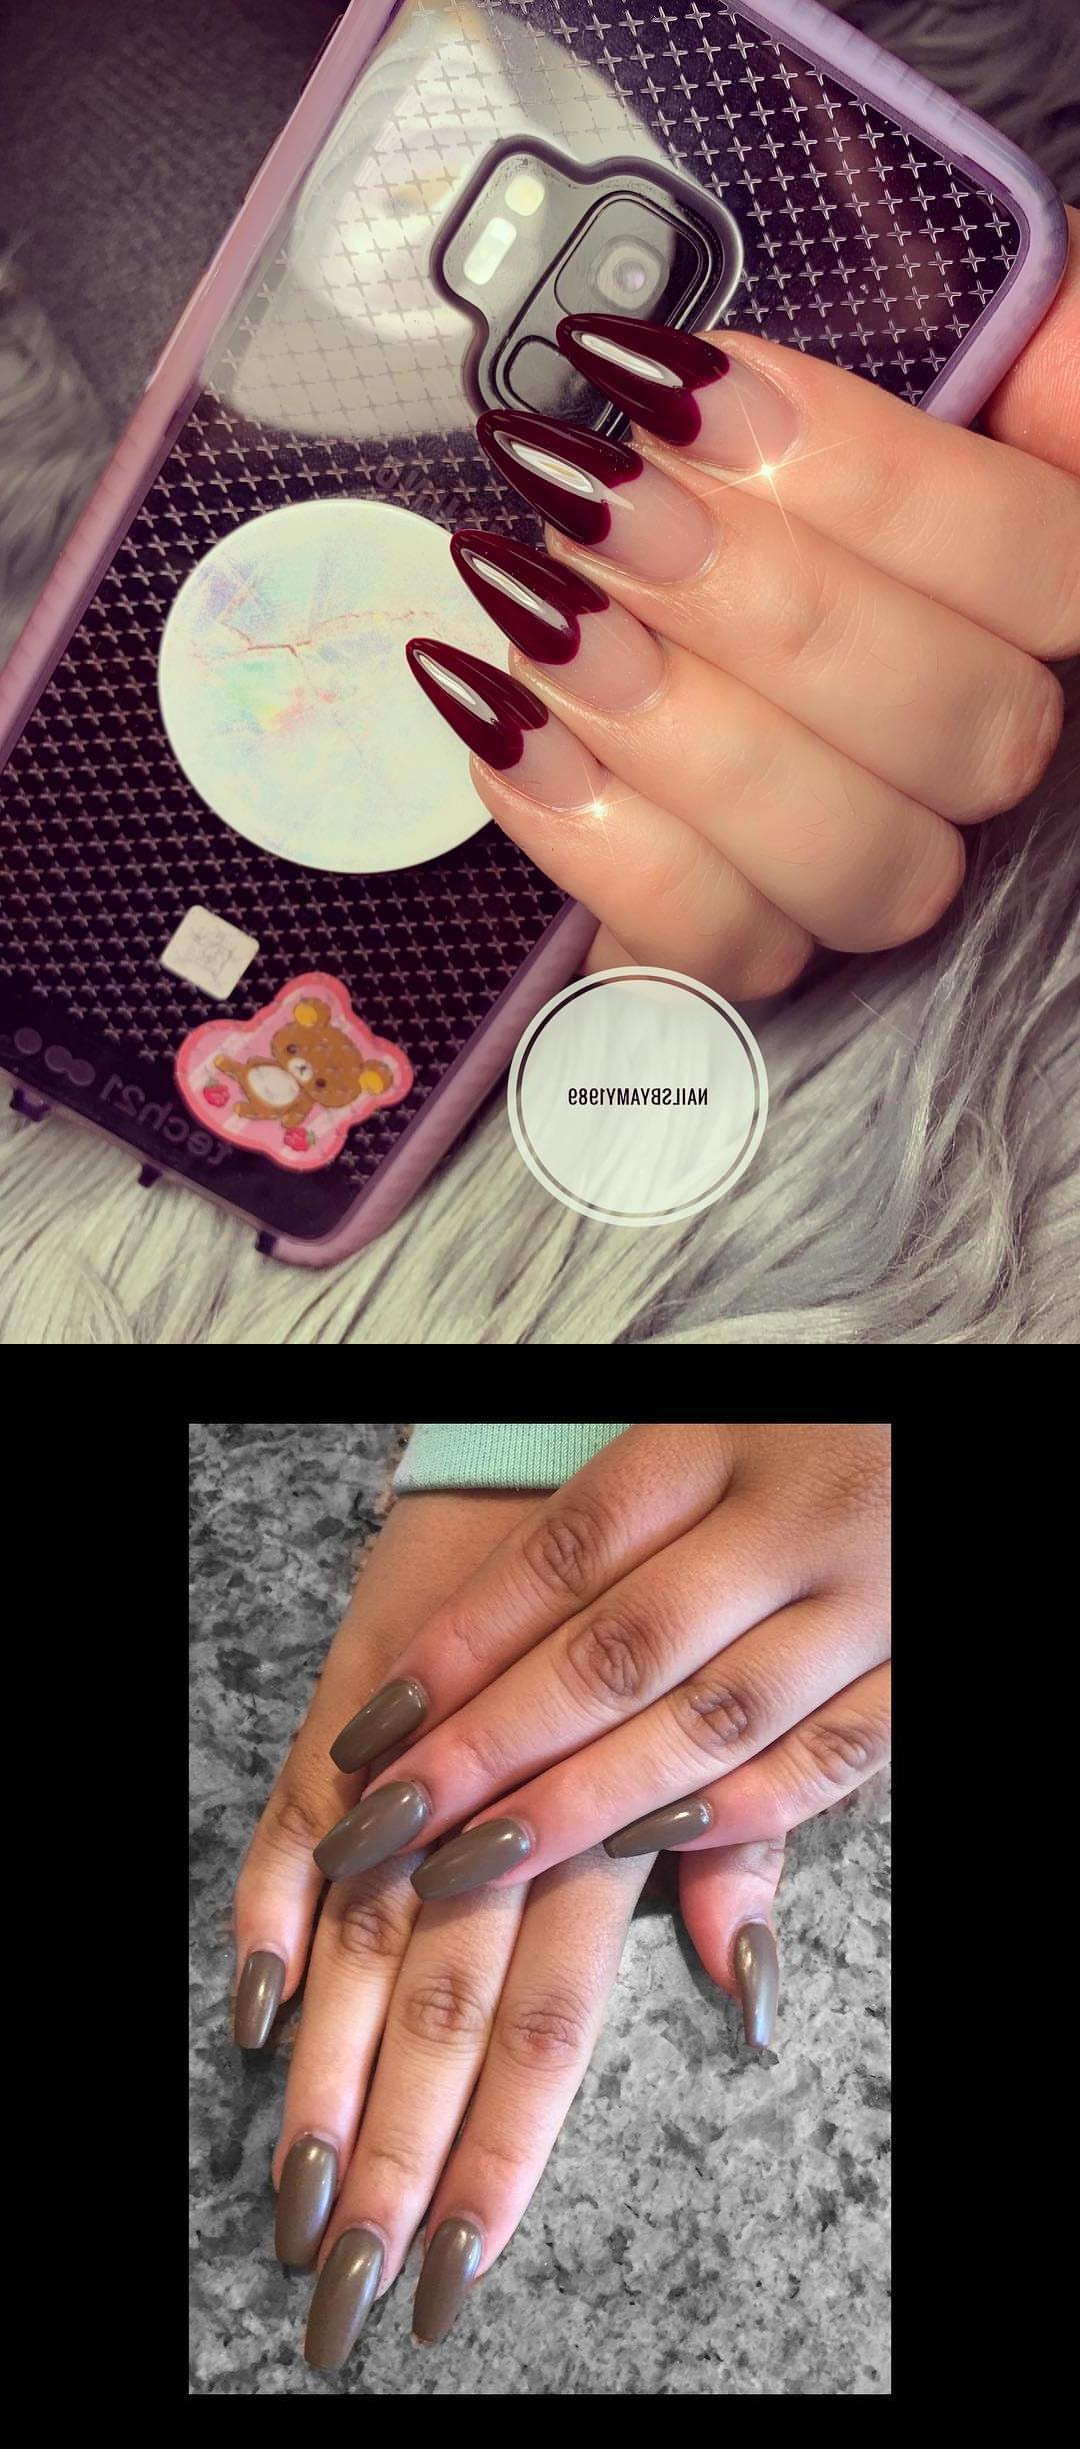 unicorn nails,gel polish remover,For the cute girl er__yn Use code : AMYNGUYEN To get 10% off for purchasing any product at Jasnail.com jasnailsupply. , nailart , jellynails , nailsofinstagram , nails, nailpro , nailmagazine , naildesigns , nailporn , naiswag , nailart , naillife , nailsonfleek , nailpro , nailtech , rvanails , 804nails , richmond , glitternails , naillover , nailsbyamy , nail-addict , nailart , nailclub , notpolish , nailartdesigns , stilettonails , coffinnails , omrenails , rainbownails , nails , nailmaster , nailfie , naildesigns , virginia Gel Brown Coffin Nails. .  , acrylicnails , nailswag , nailsdid , nailsofinstagram , manicure , instabeauty , instanails , newnails , prettynails , simplenails , simpleacrylics , beautifulnails  , rockyournails , nails2inspire , nailpromote , nailstoinspire  , nailpolishaddict , nailart , naildesigns , nailartaddict , nailartofinstagram , nailartoftheday , nailartdiary , nailartwow , nailartsociety , nailartappreciation , coffinnails , brownnails , gelnails , gelmanicure